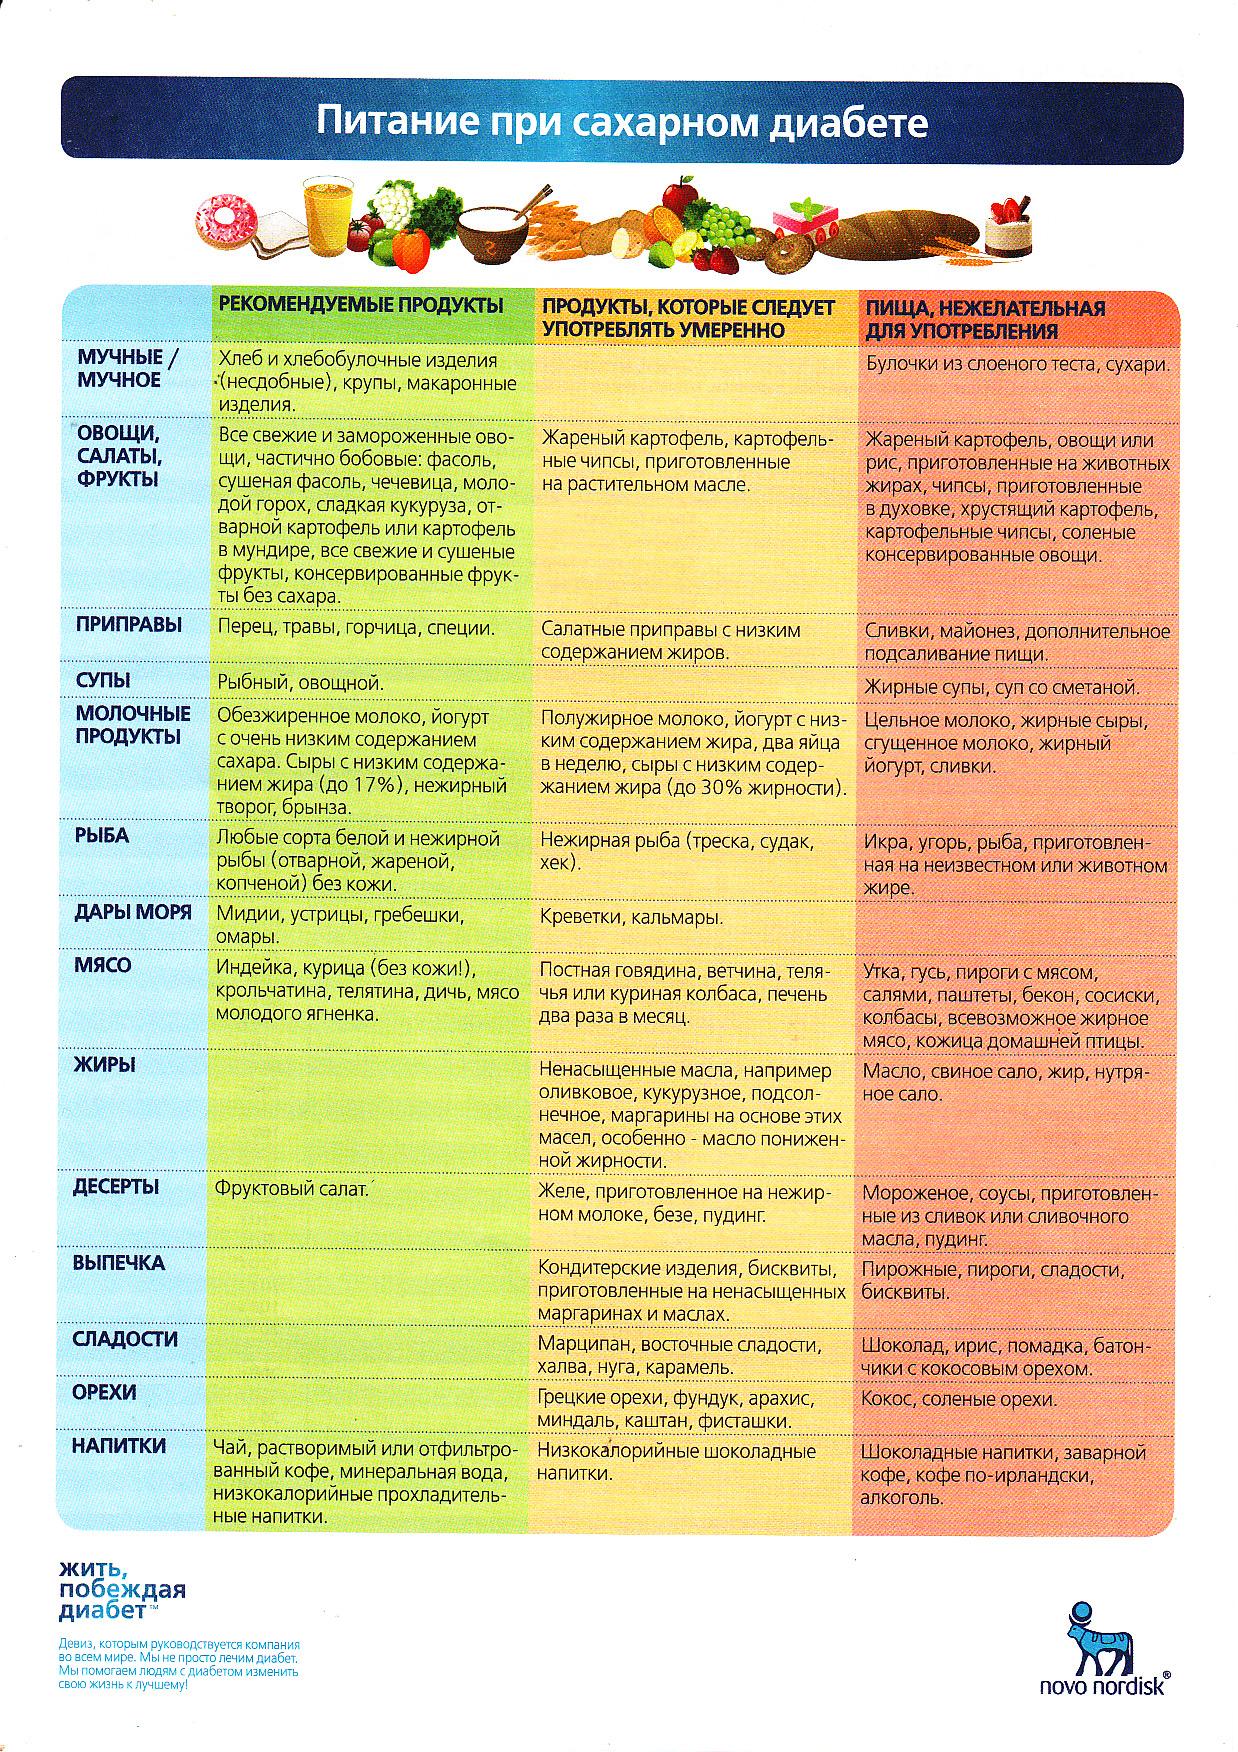 Рыба при сахарном диабете 2 типа таблица